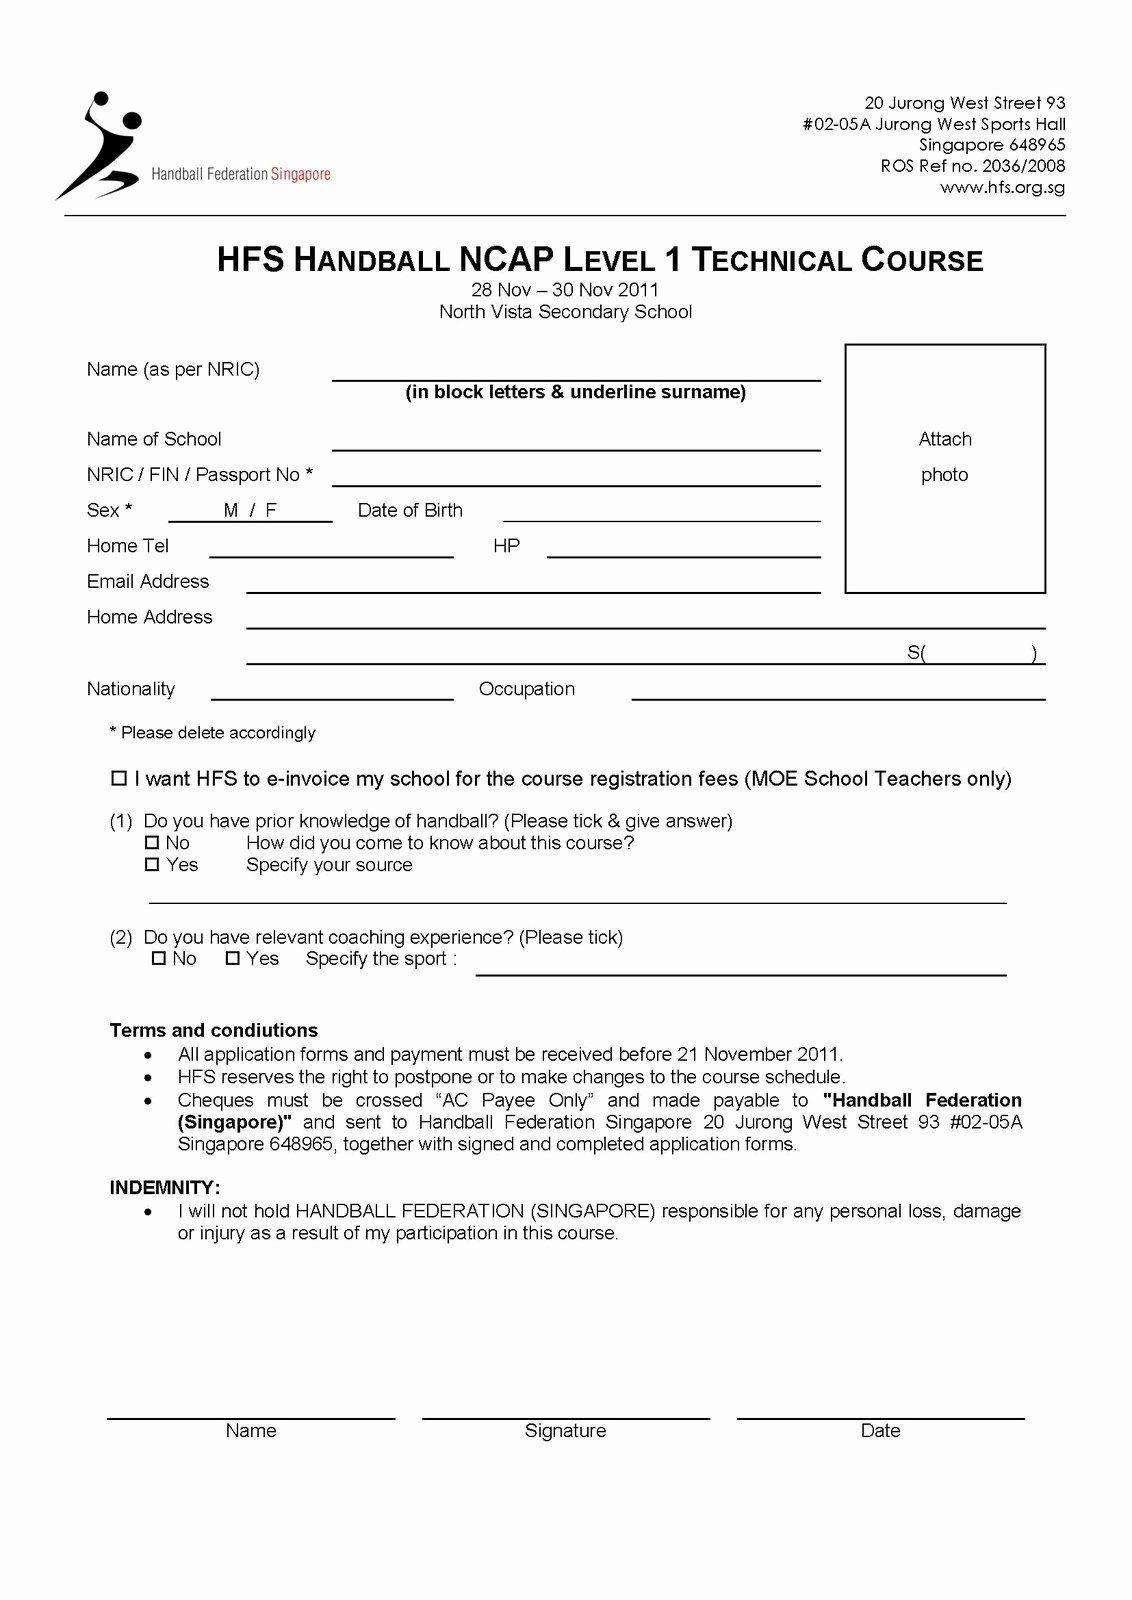 Sports Registration Forms Template Unique I Love Handball Do You October 2011 Registration Form Sign Up Sheets Templates